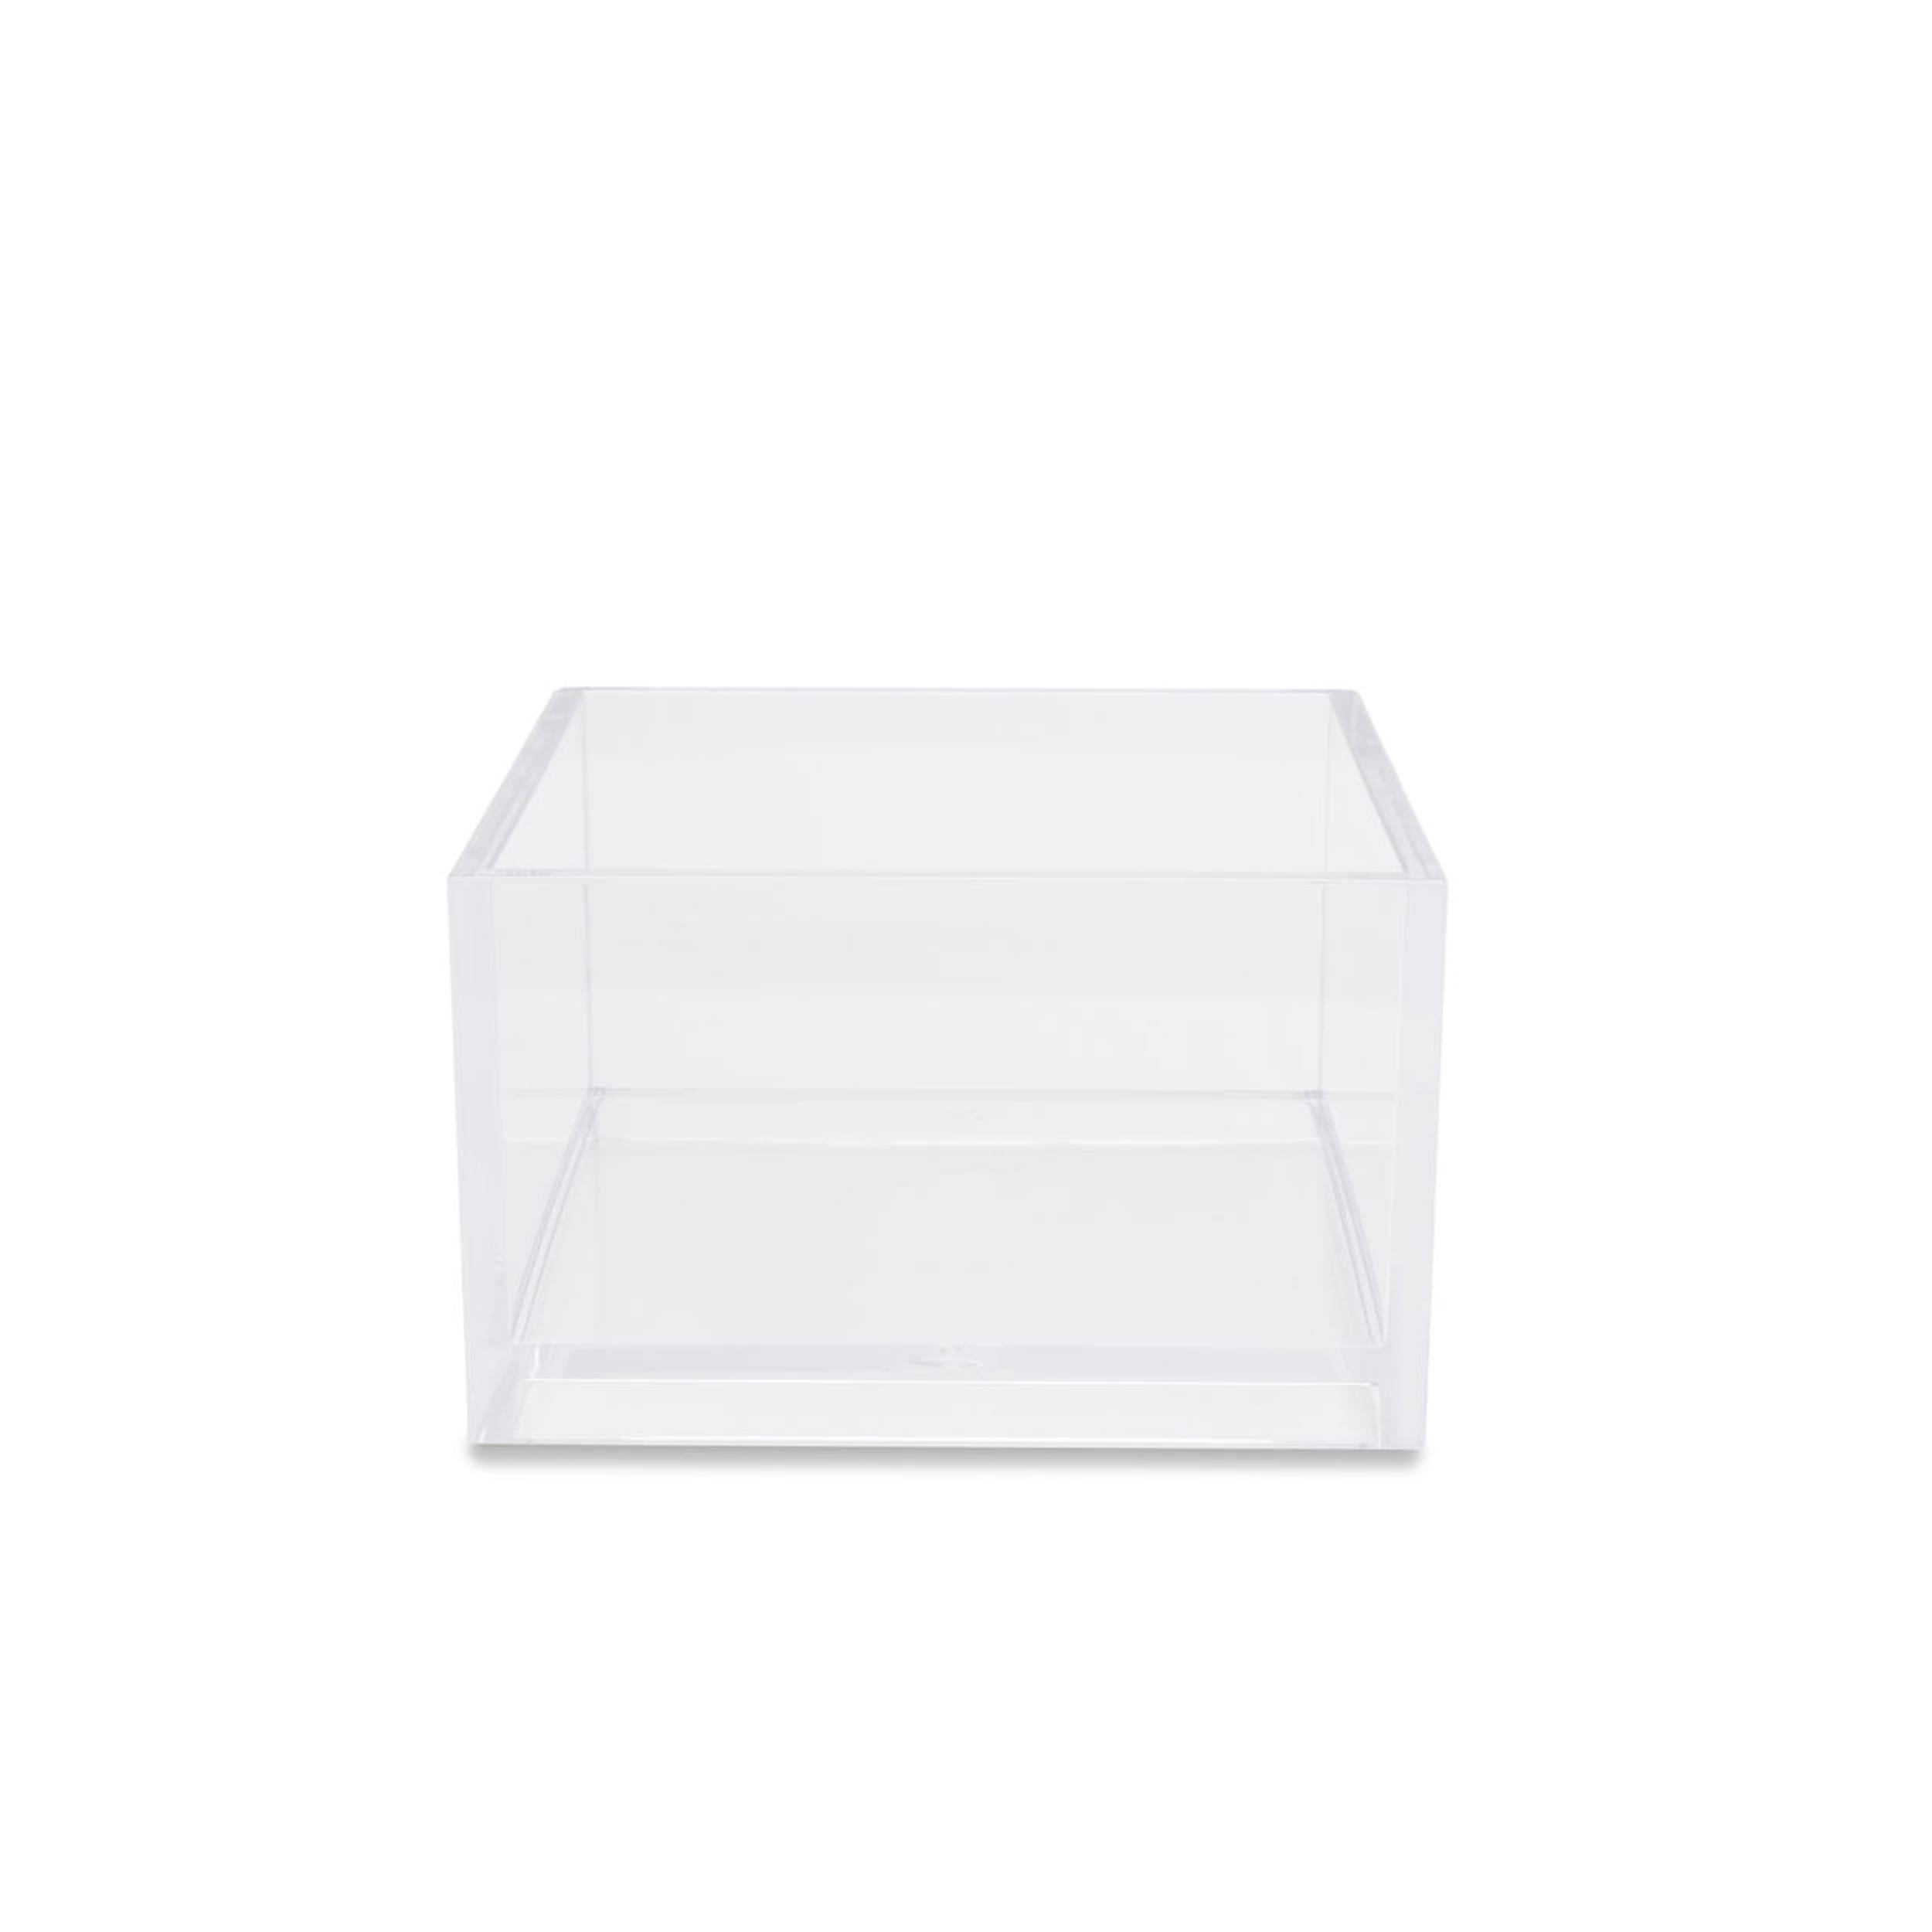 Image of Box MEENA